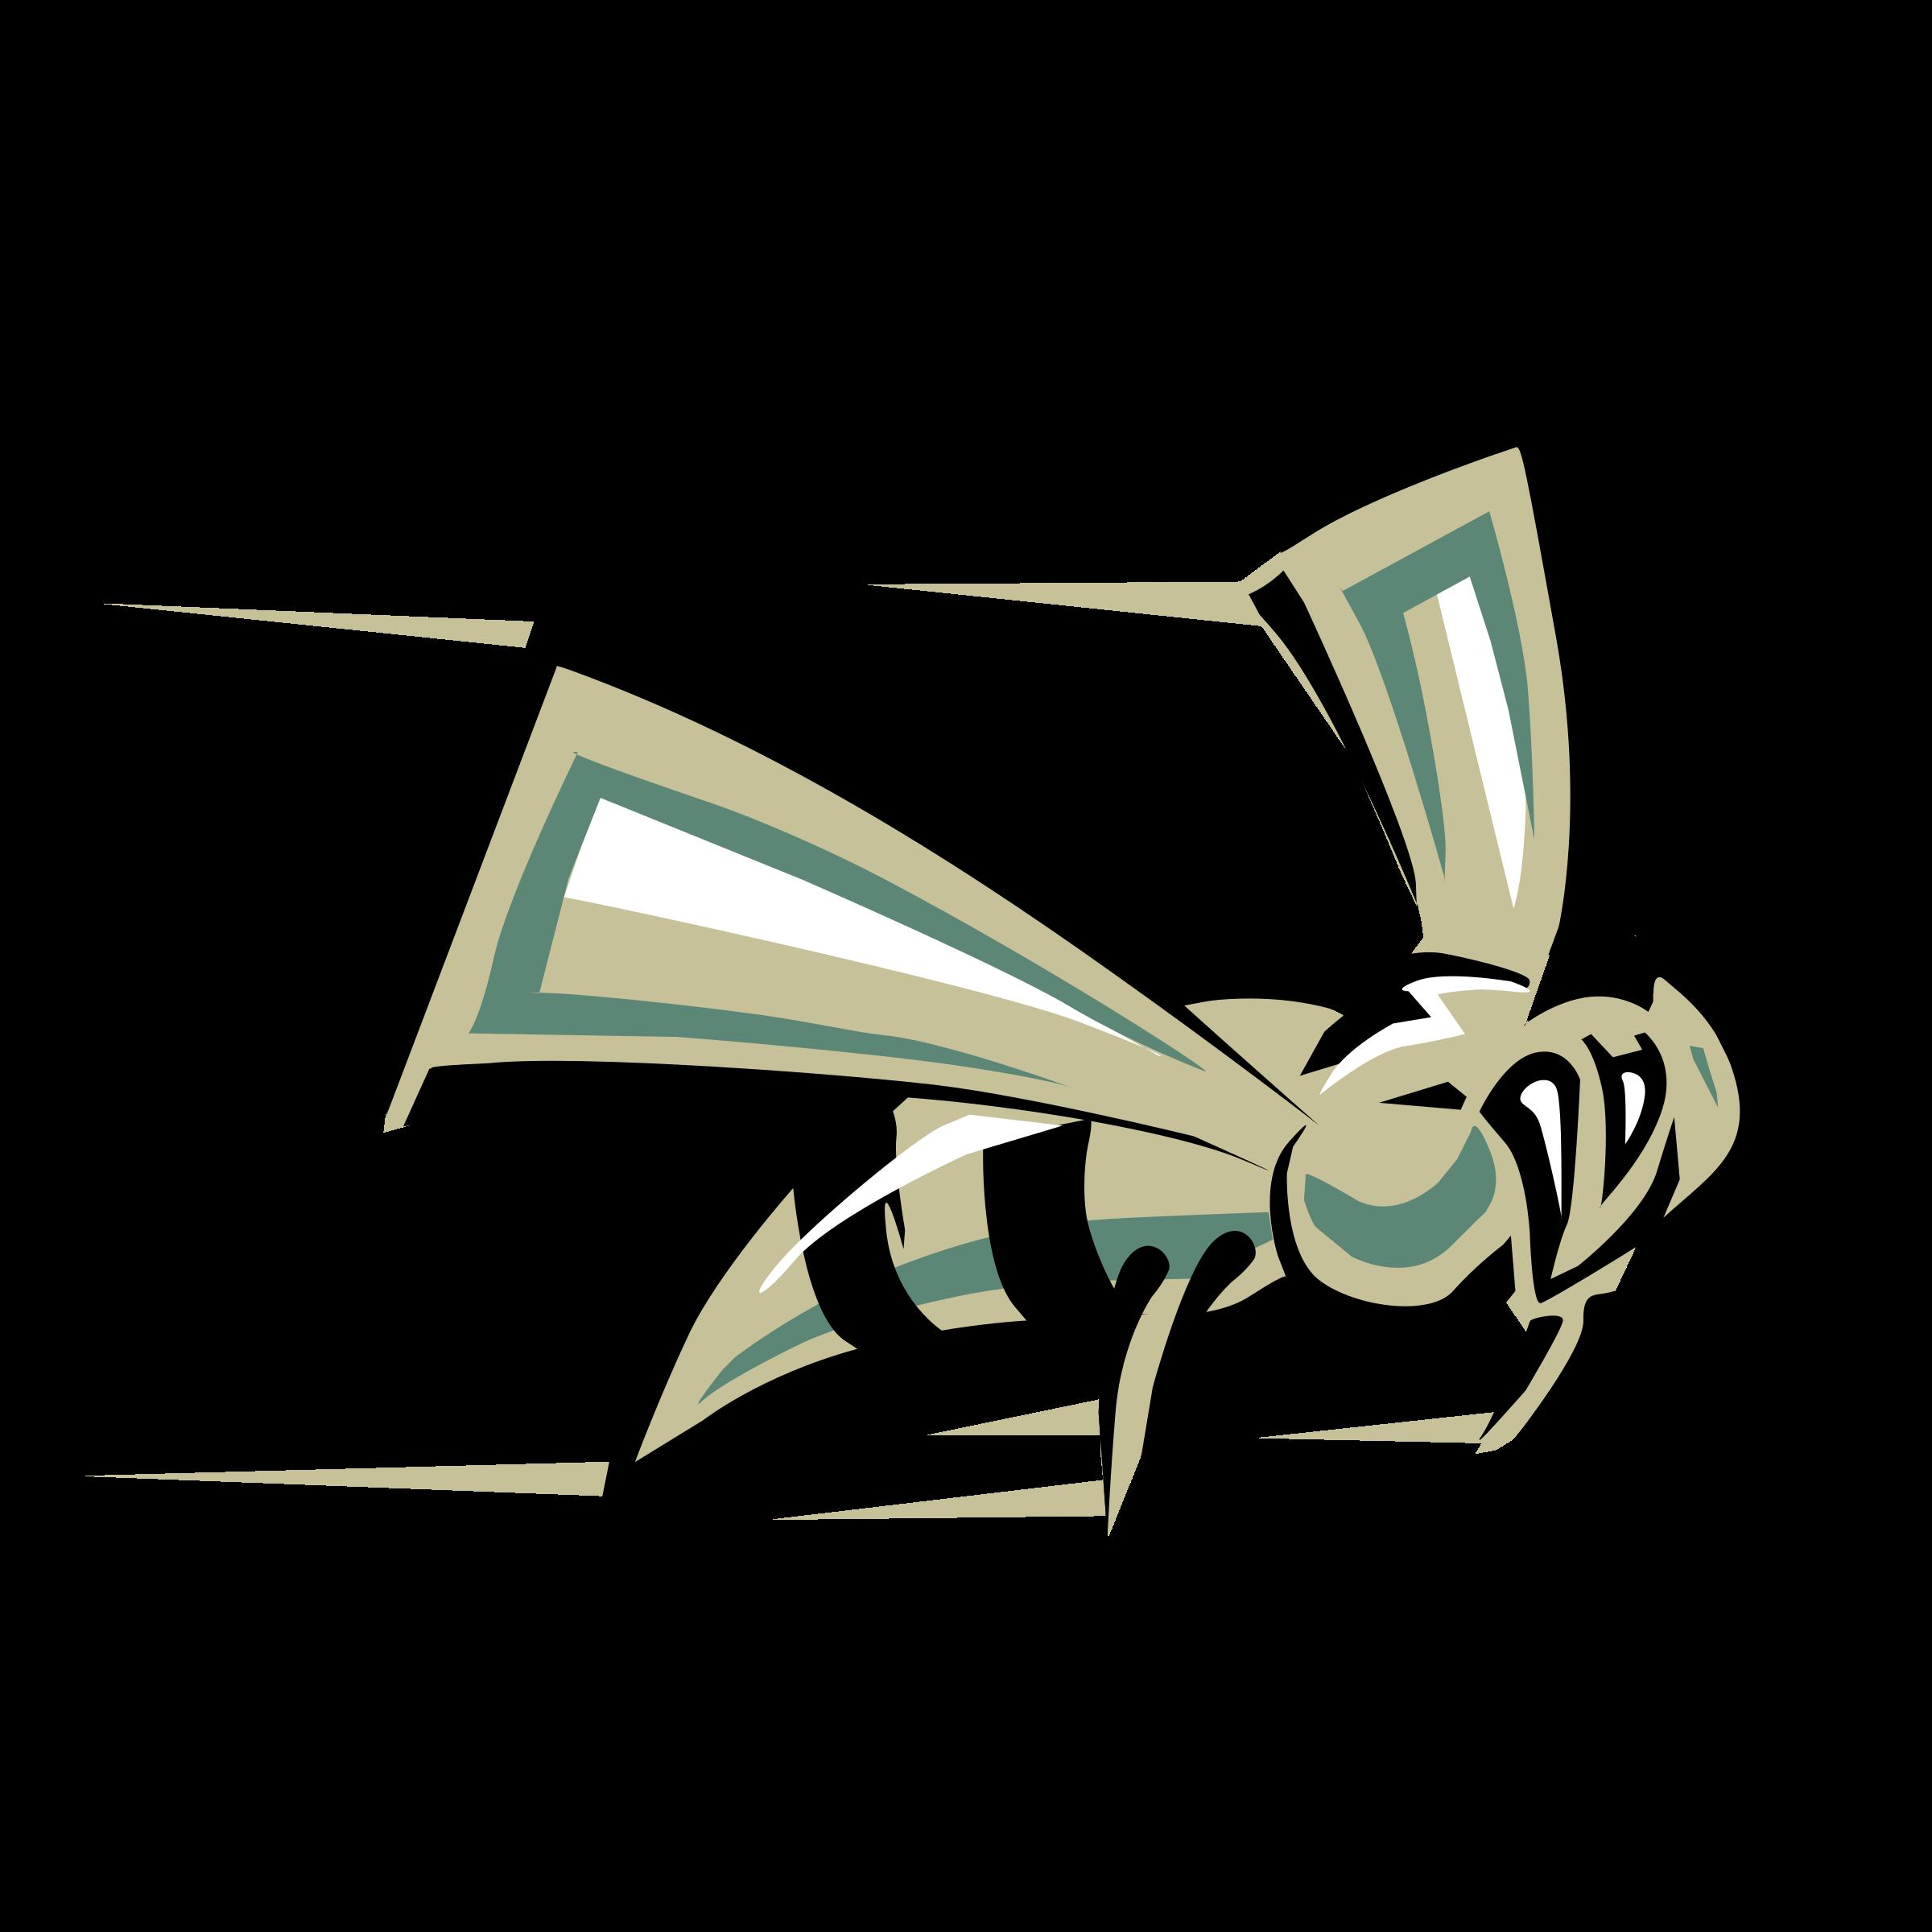 Sacramento state hornets logo. Hornet clipart svg